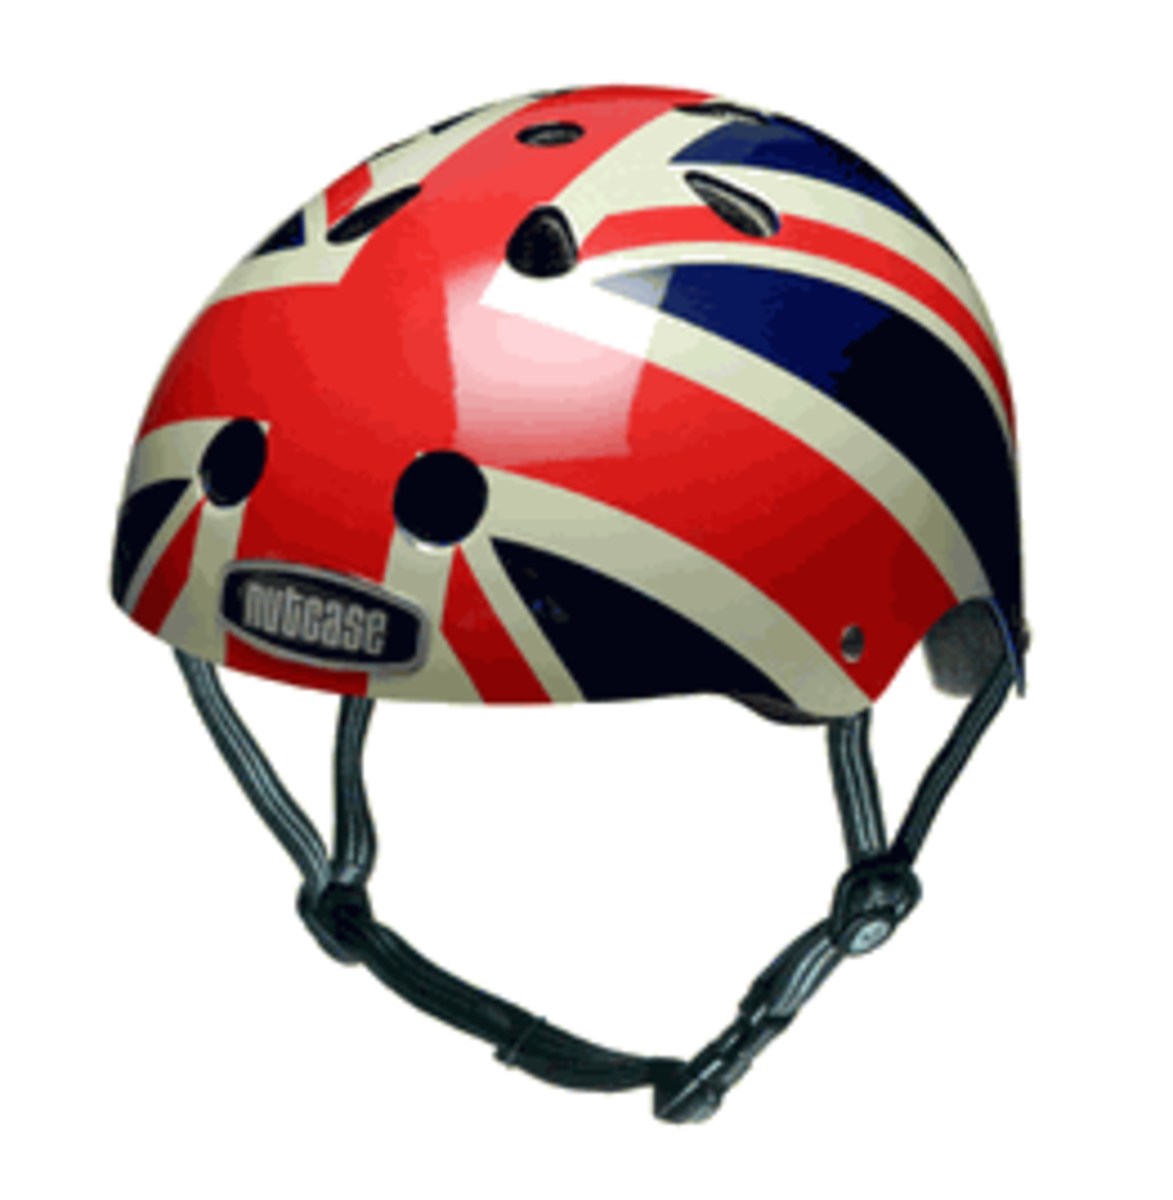 stylish-helmets